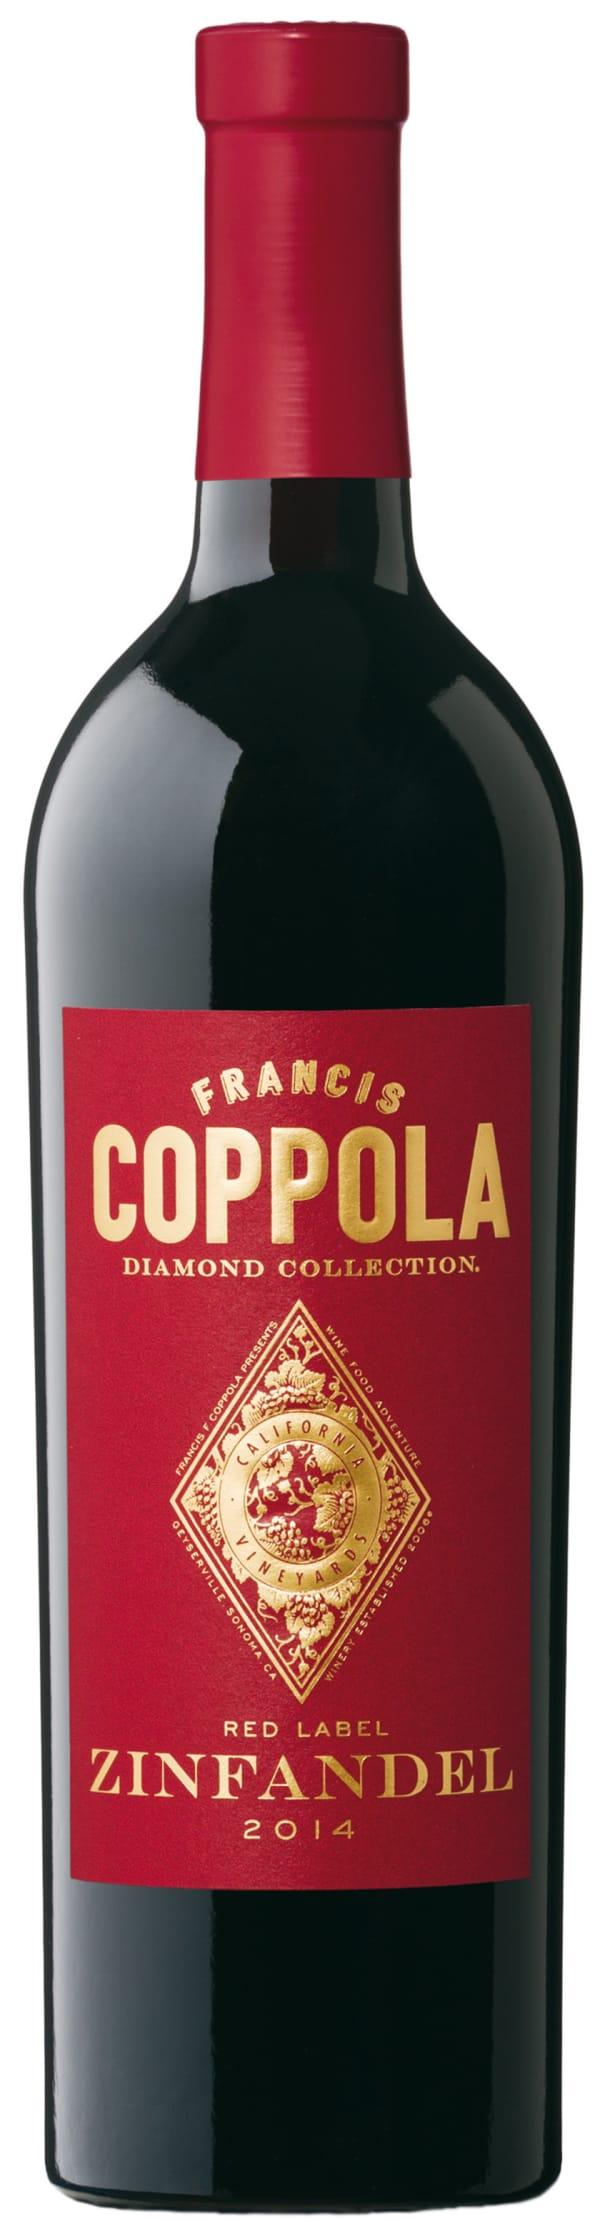 Coppola Diamond Collection Zinfandel 2017